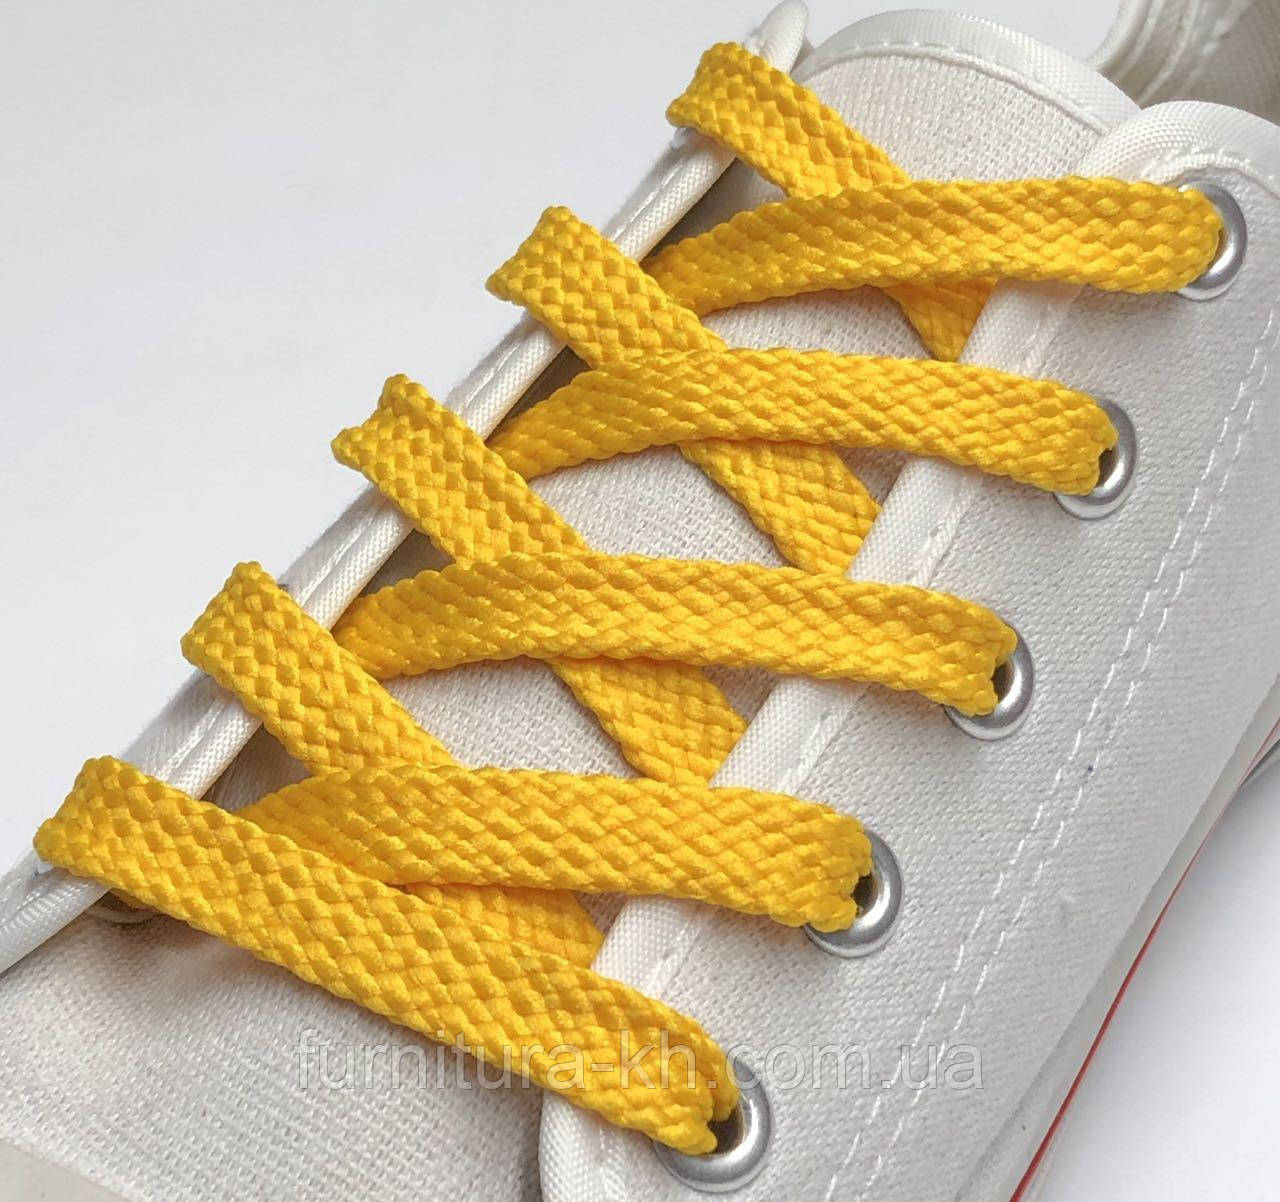 Шнурок Простой Плоский Длинна 1 метр  цвет Желтый (ширина 7 мм)